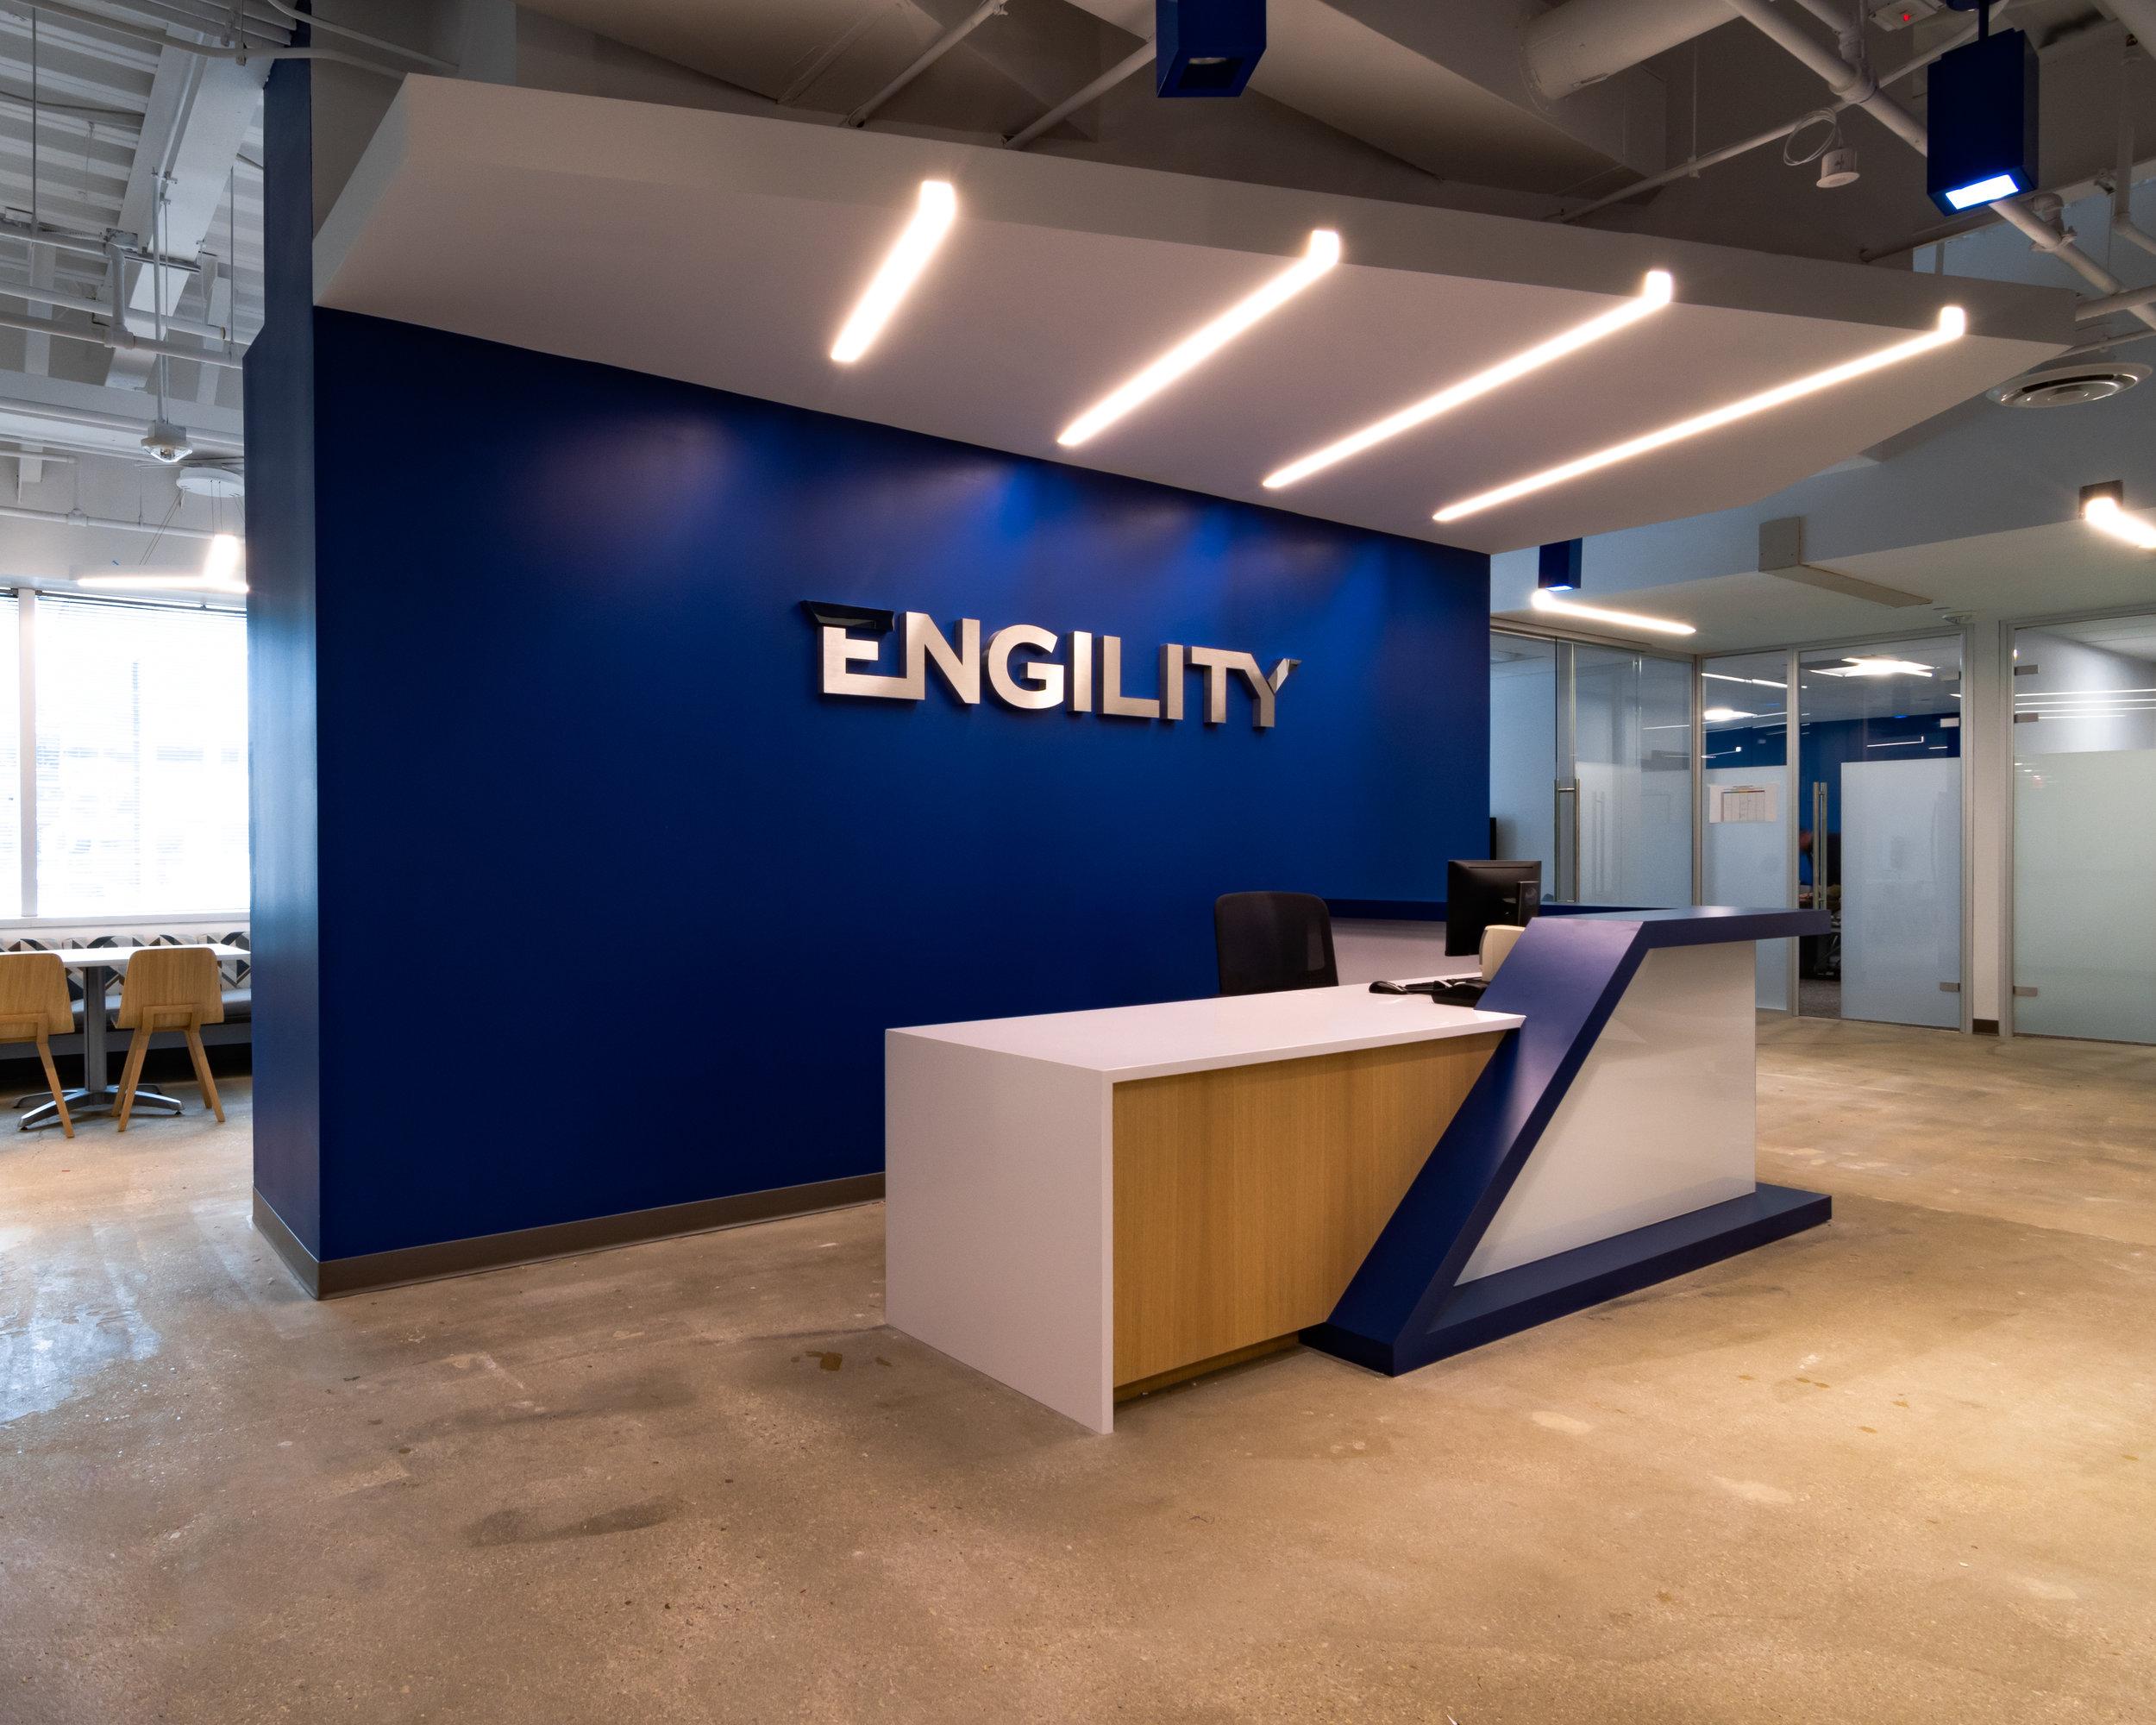 Engility-4.jpg